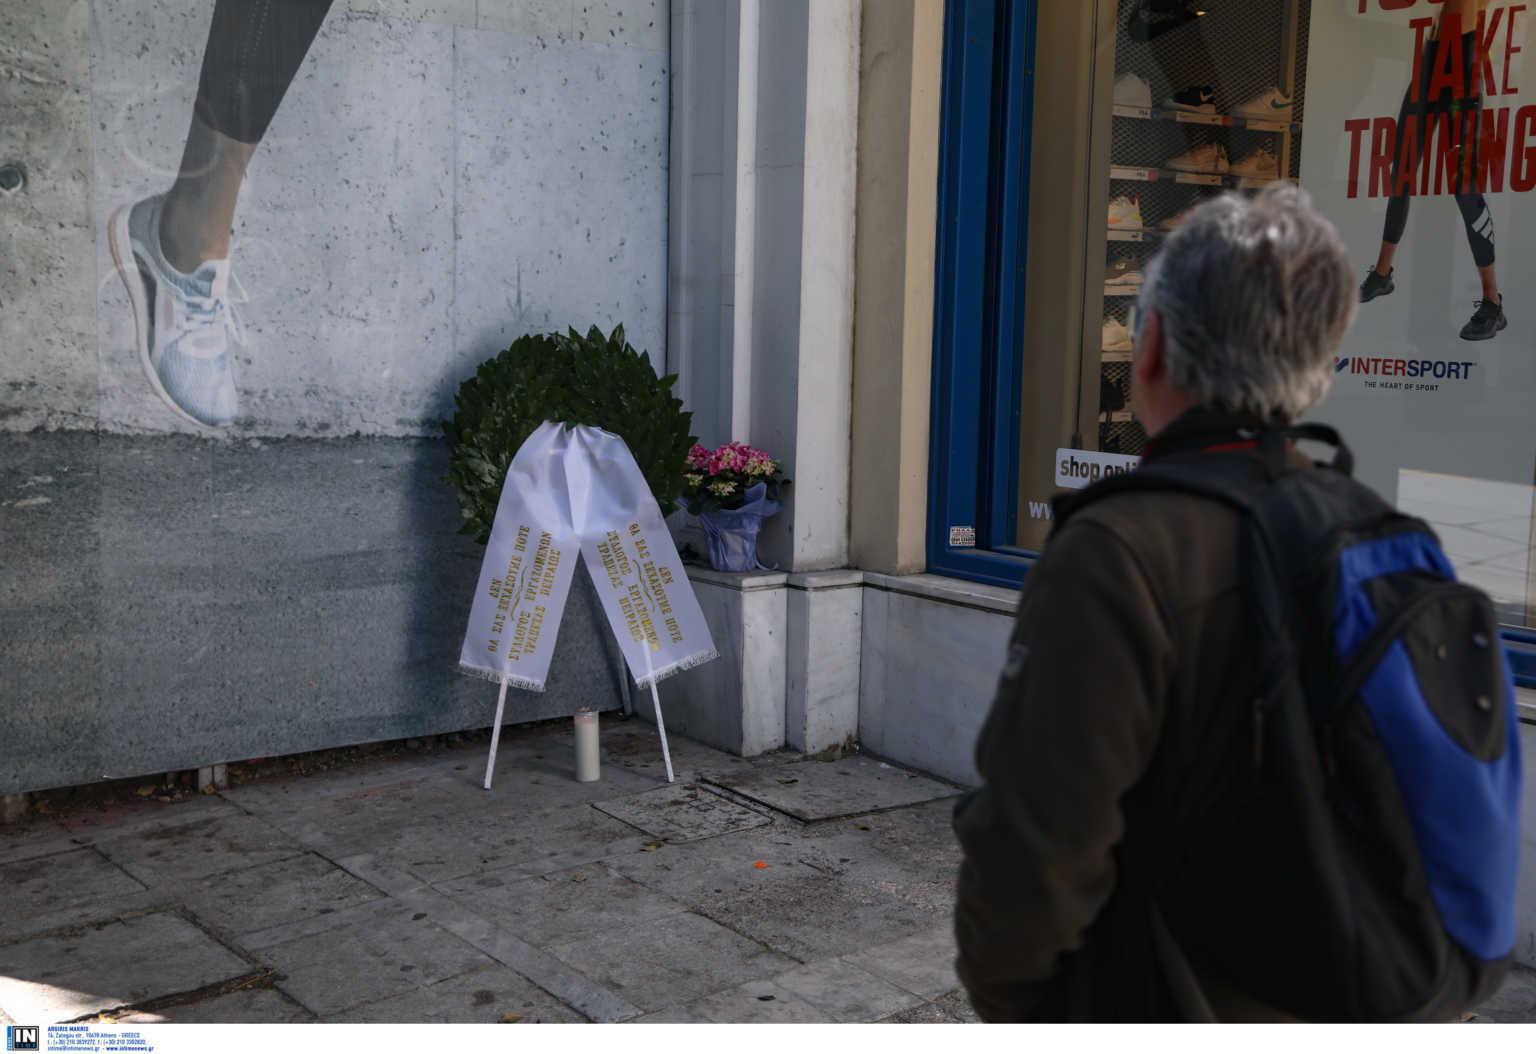 Marfin: Ο Μητσοτάκης καλεί τους αρχηγούς στα αποκαλυπτήρια της πλακέτας στη μνήμη των νεκρών